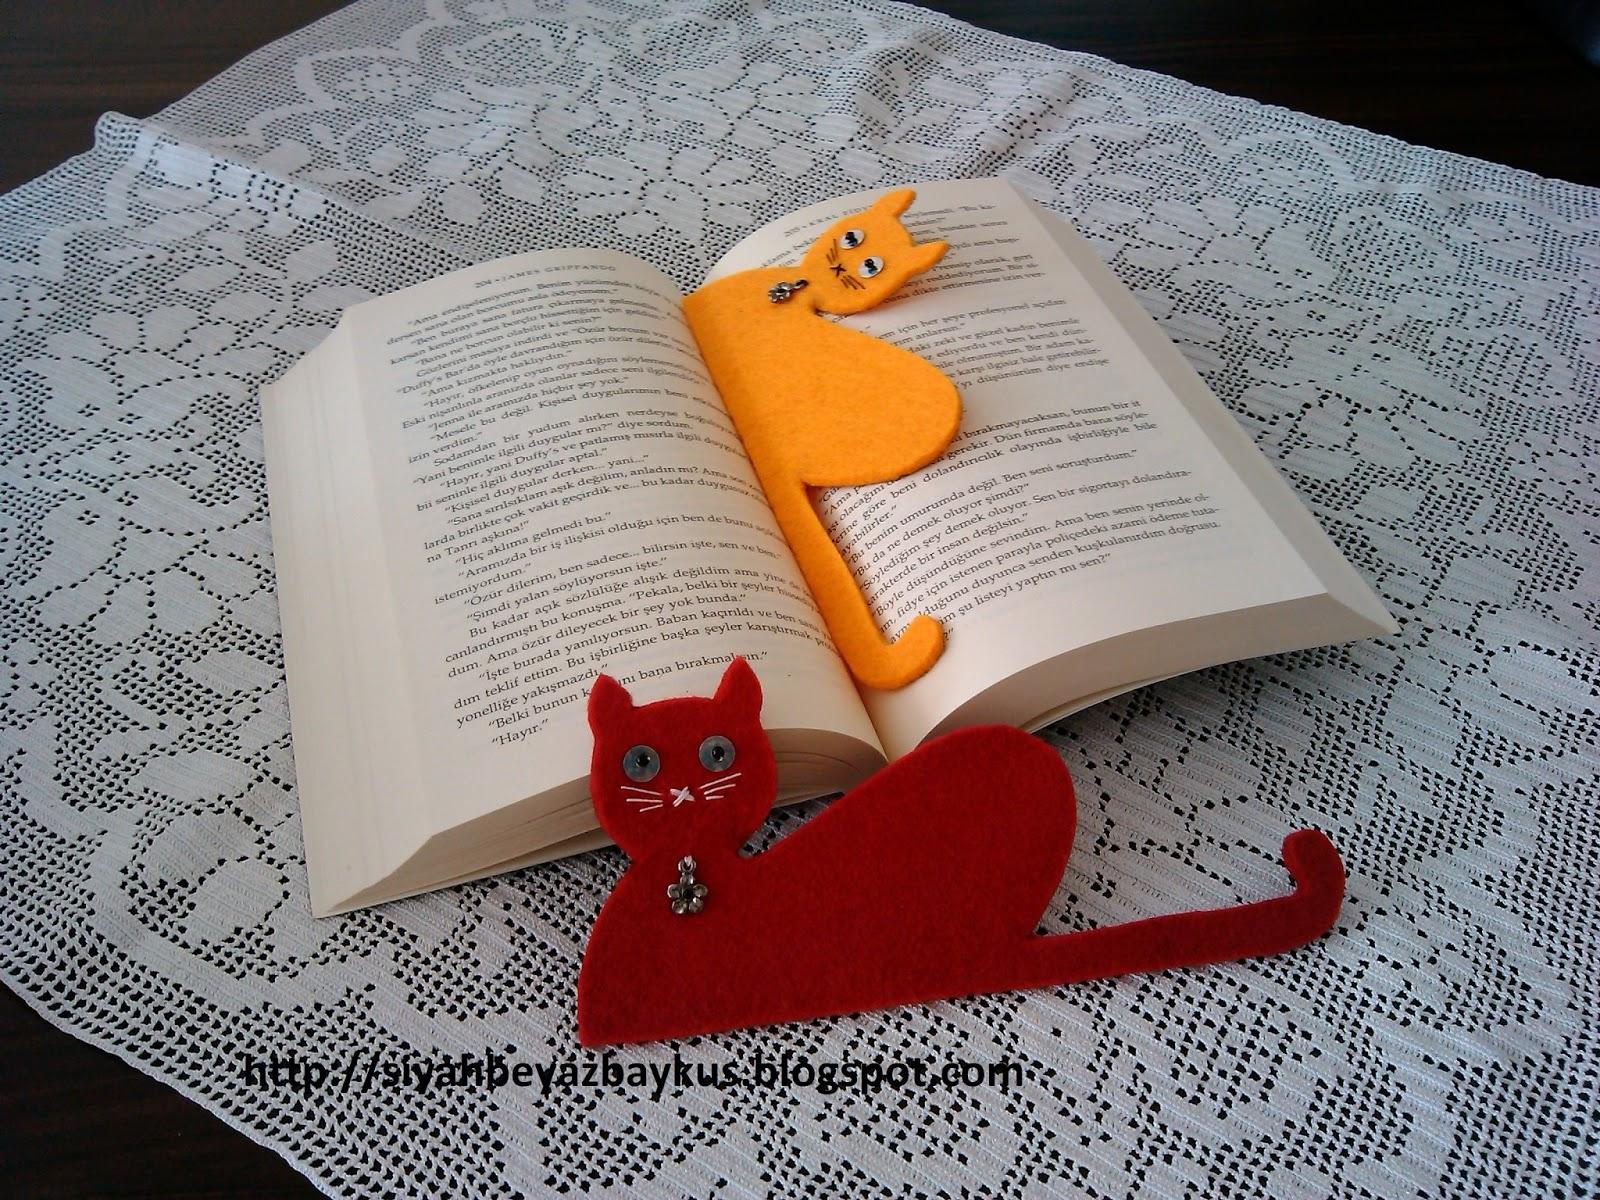 Siyah Beyaz Baykus Keceden Kedili Kitap Ayraci